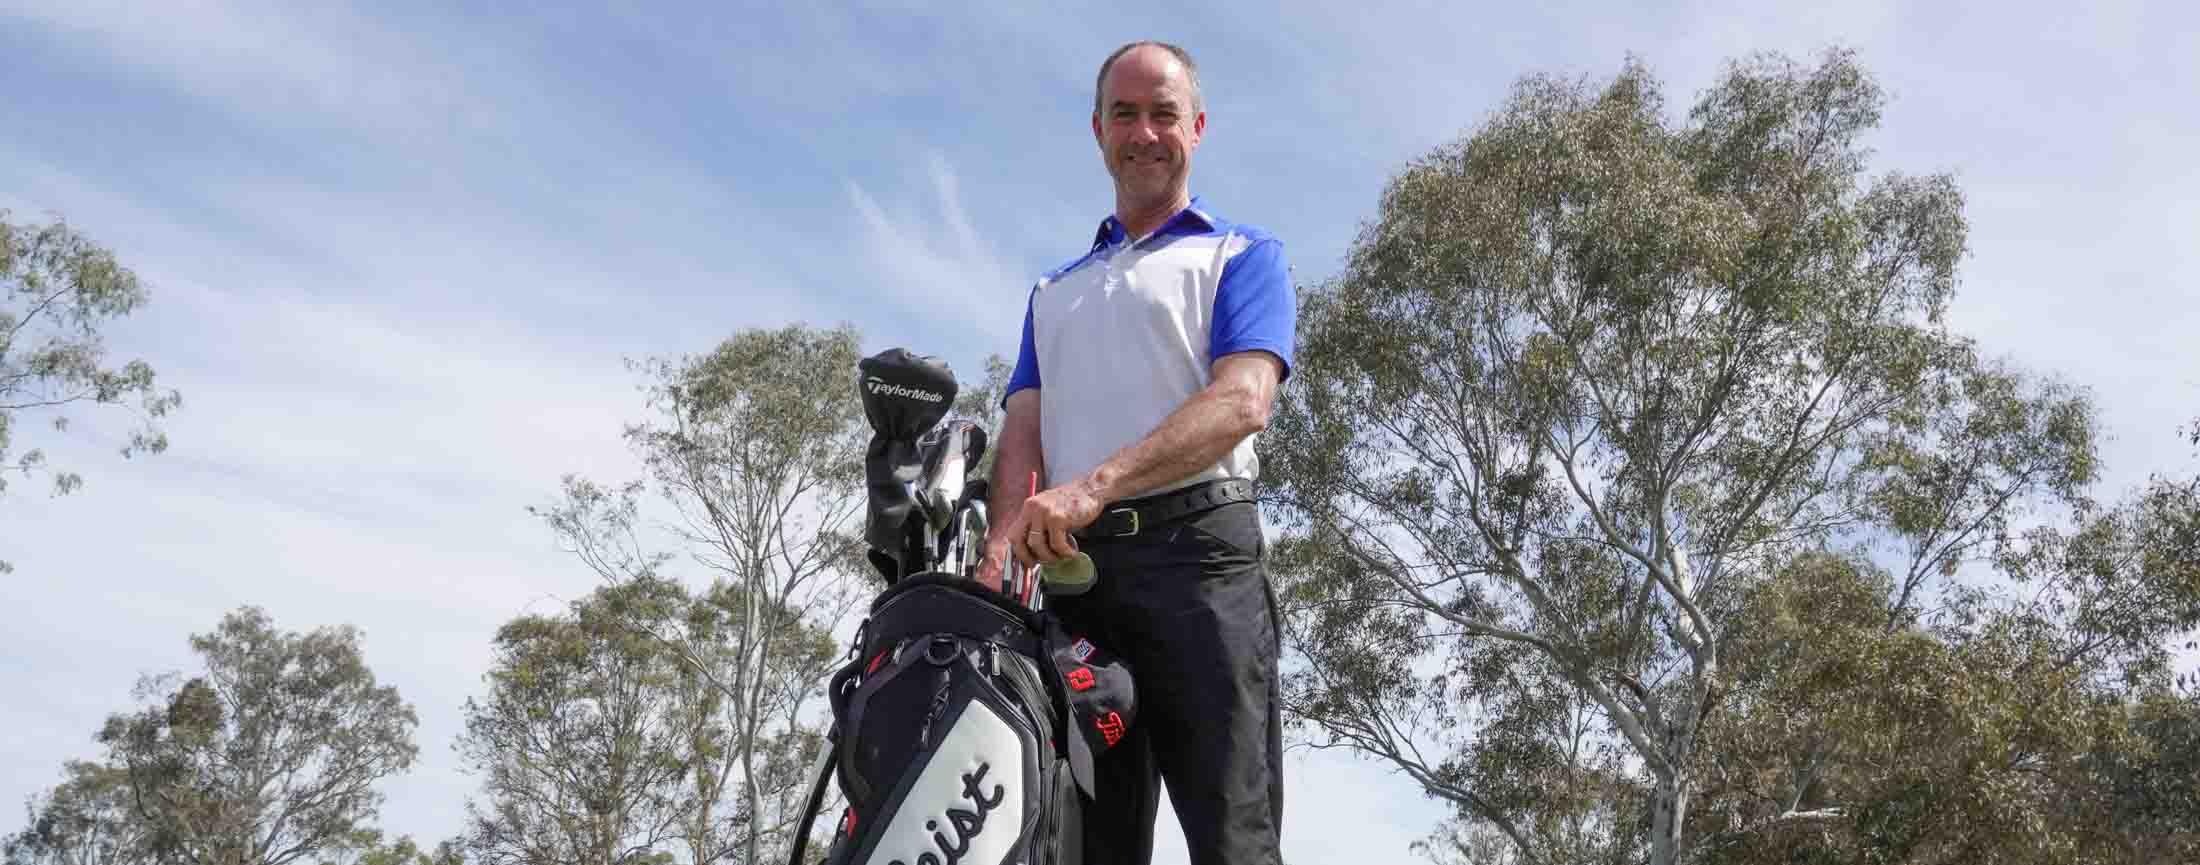 Garant Kenny NSW Senior Open